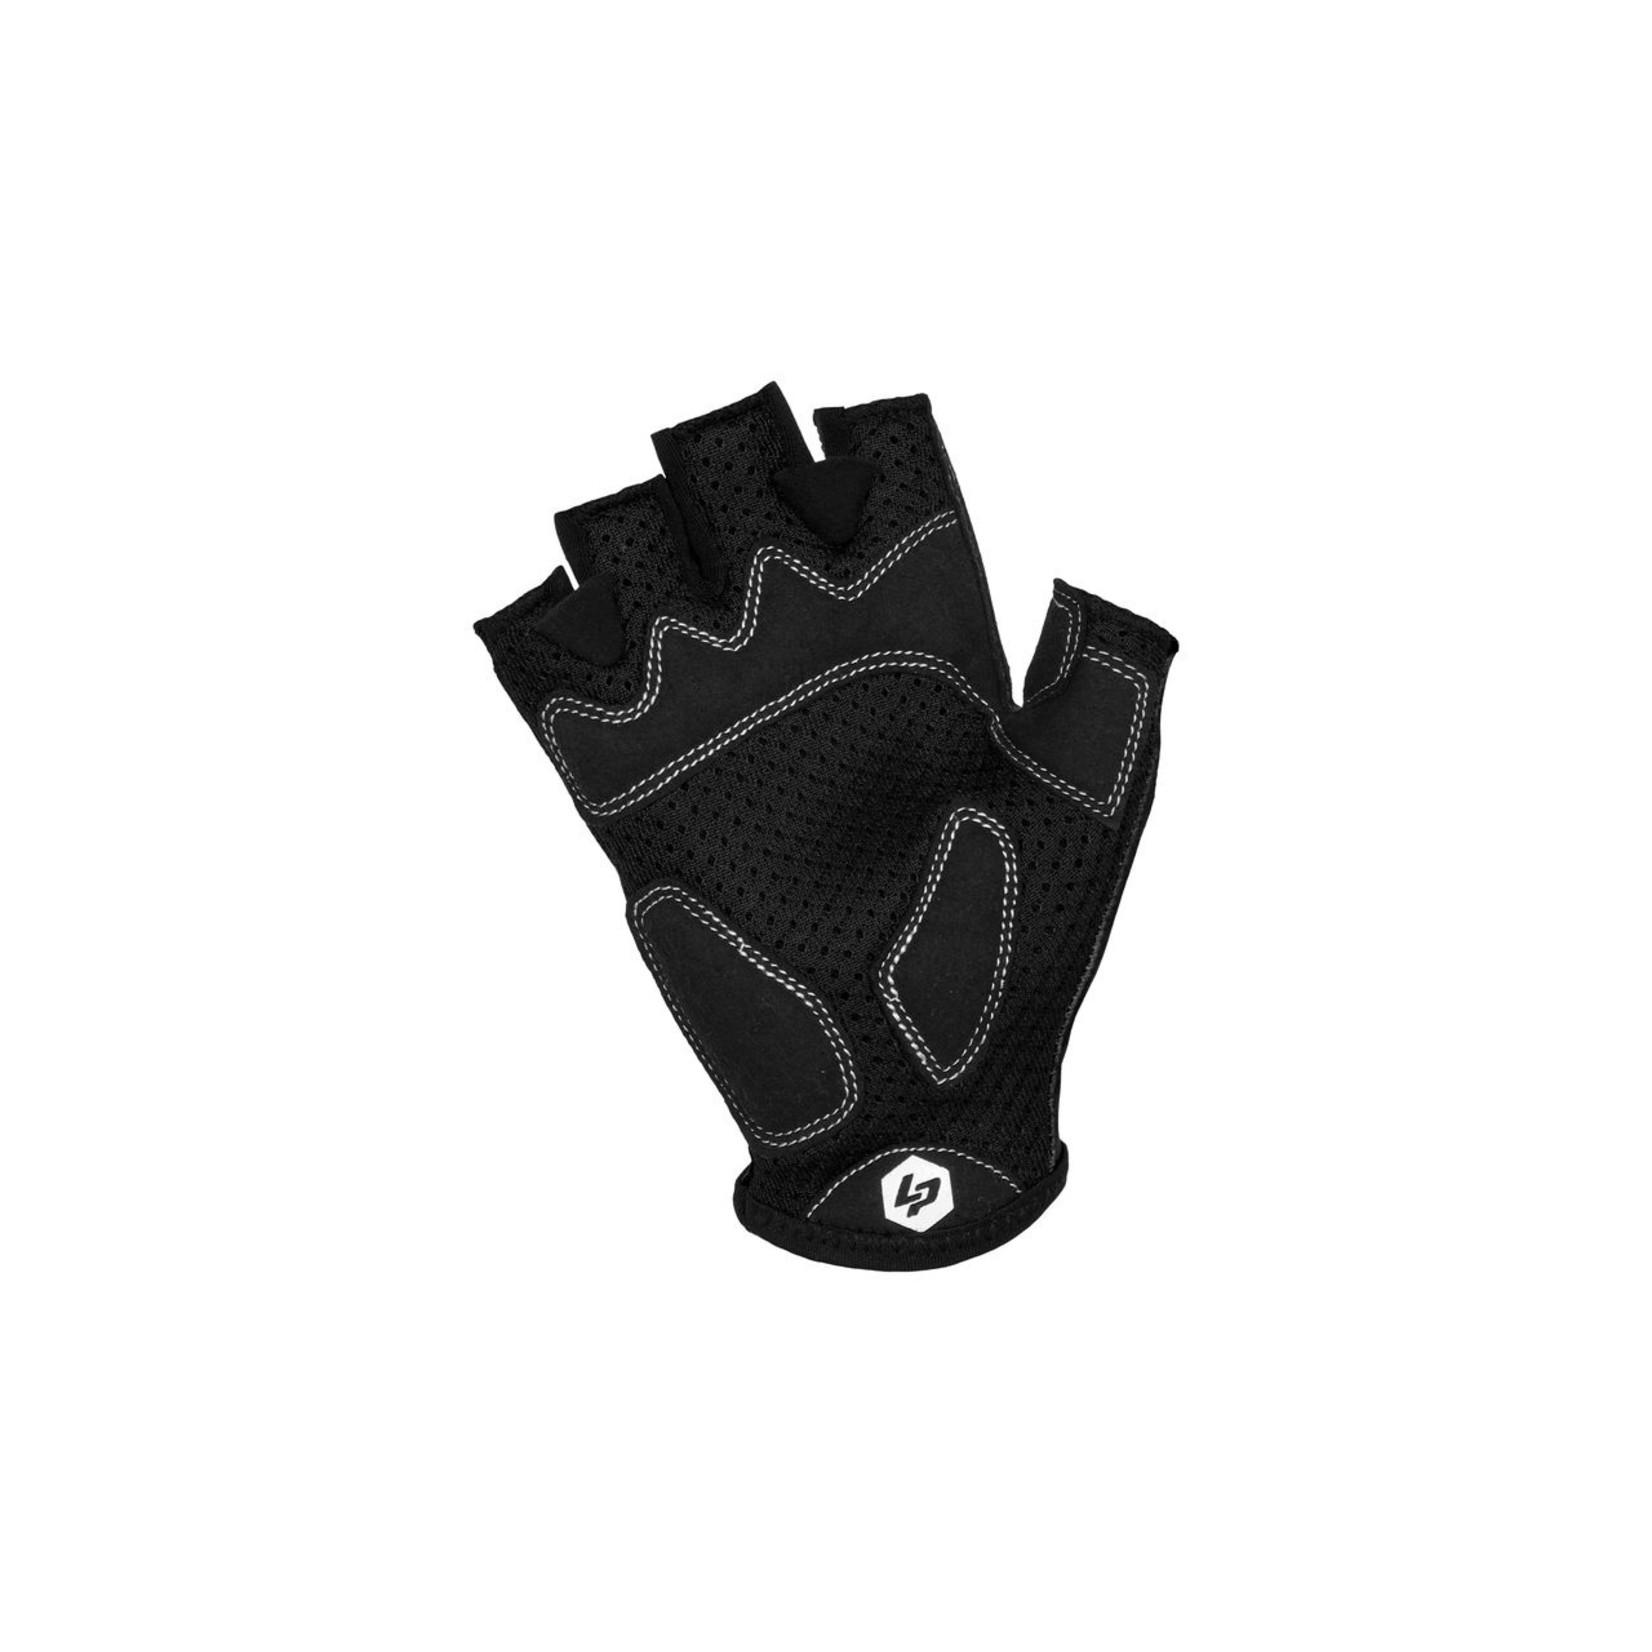 Lapierre San Remo Cycling Gloves - Large